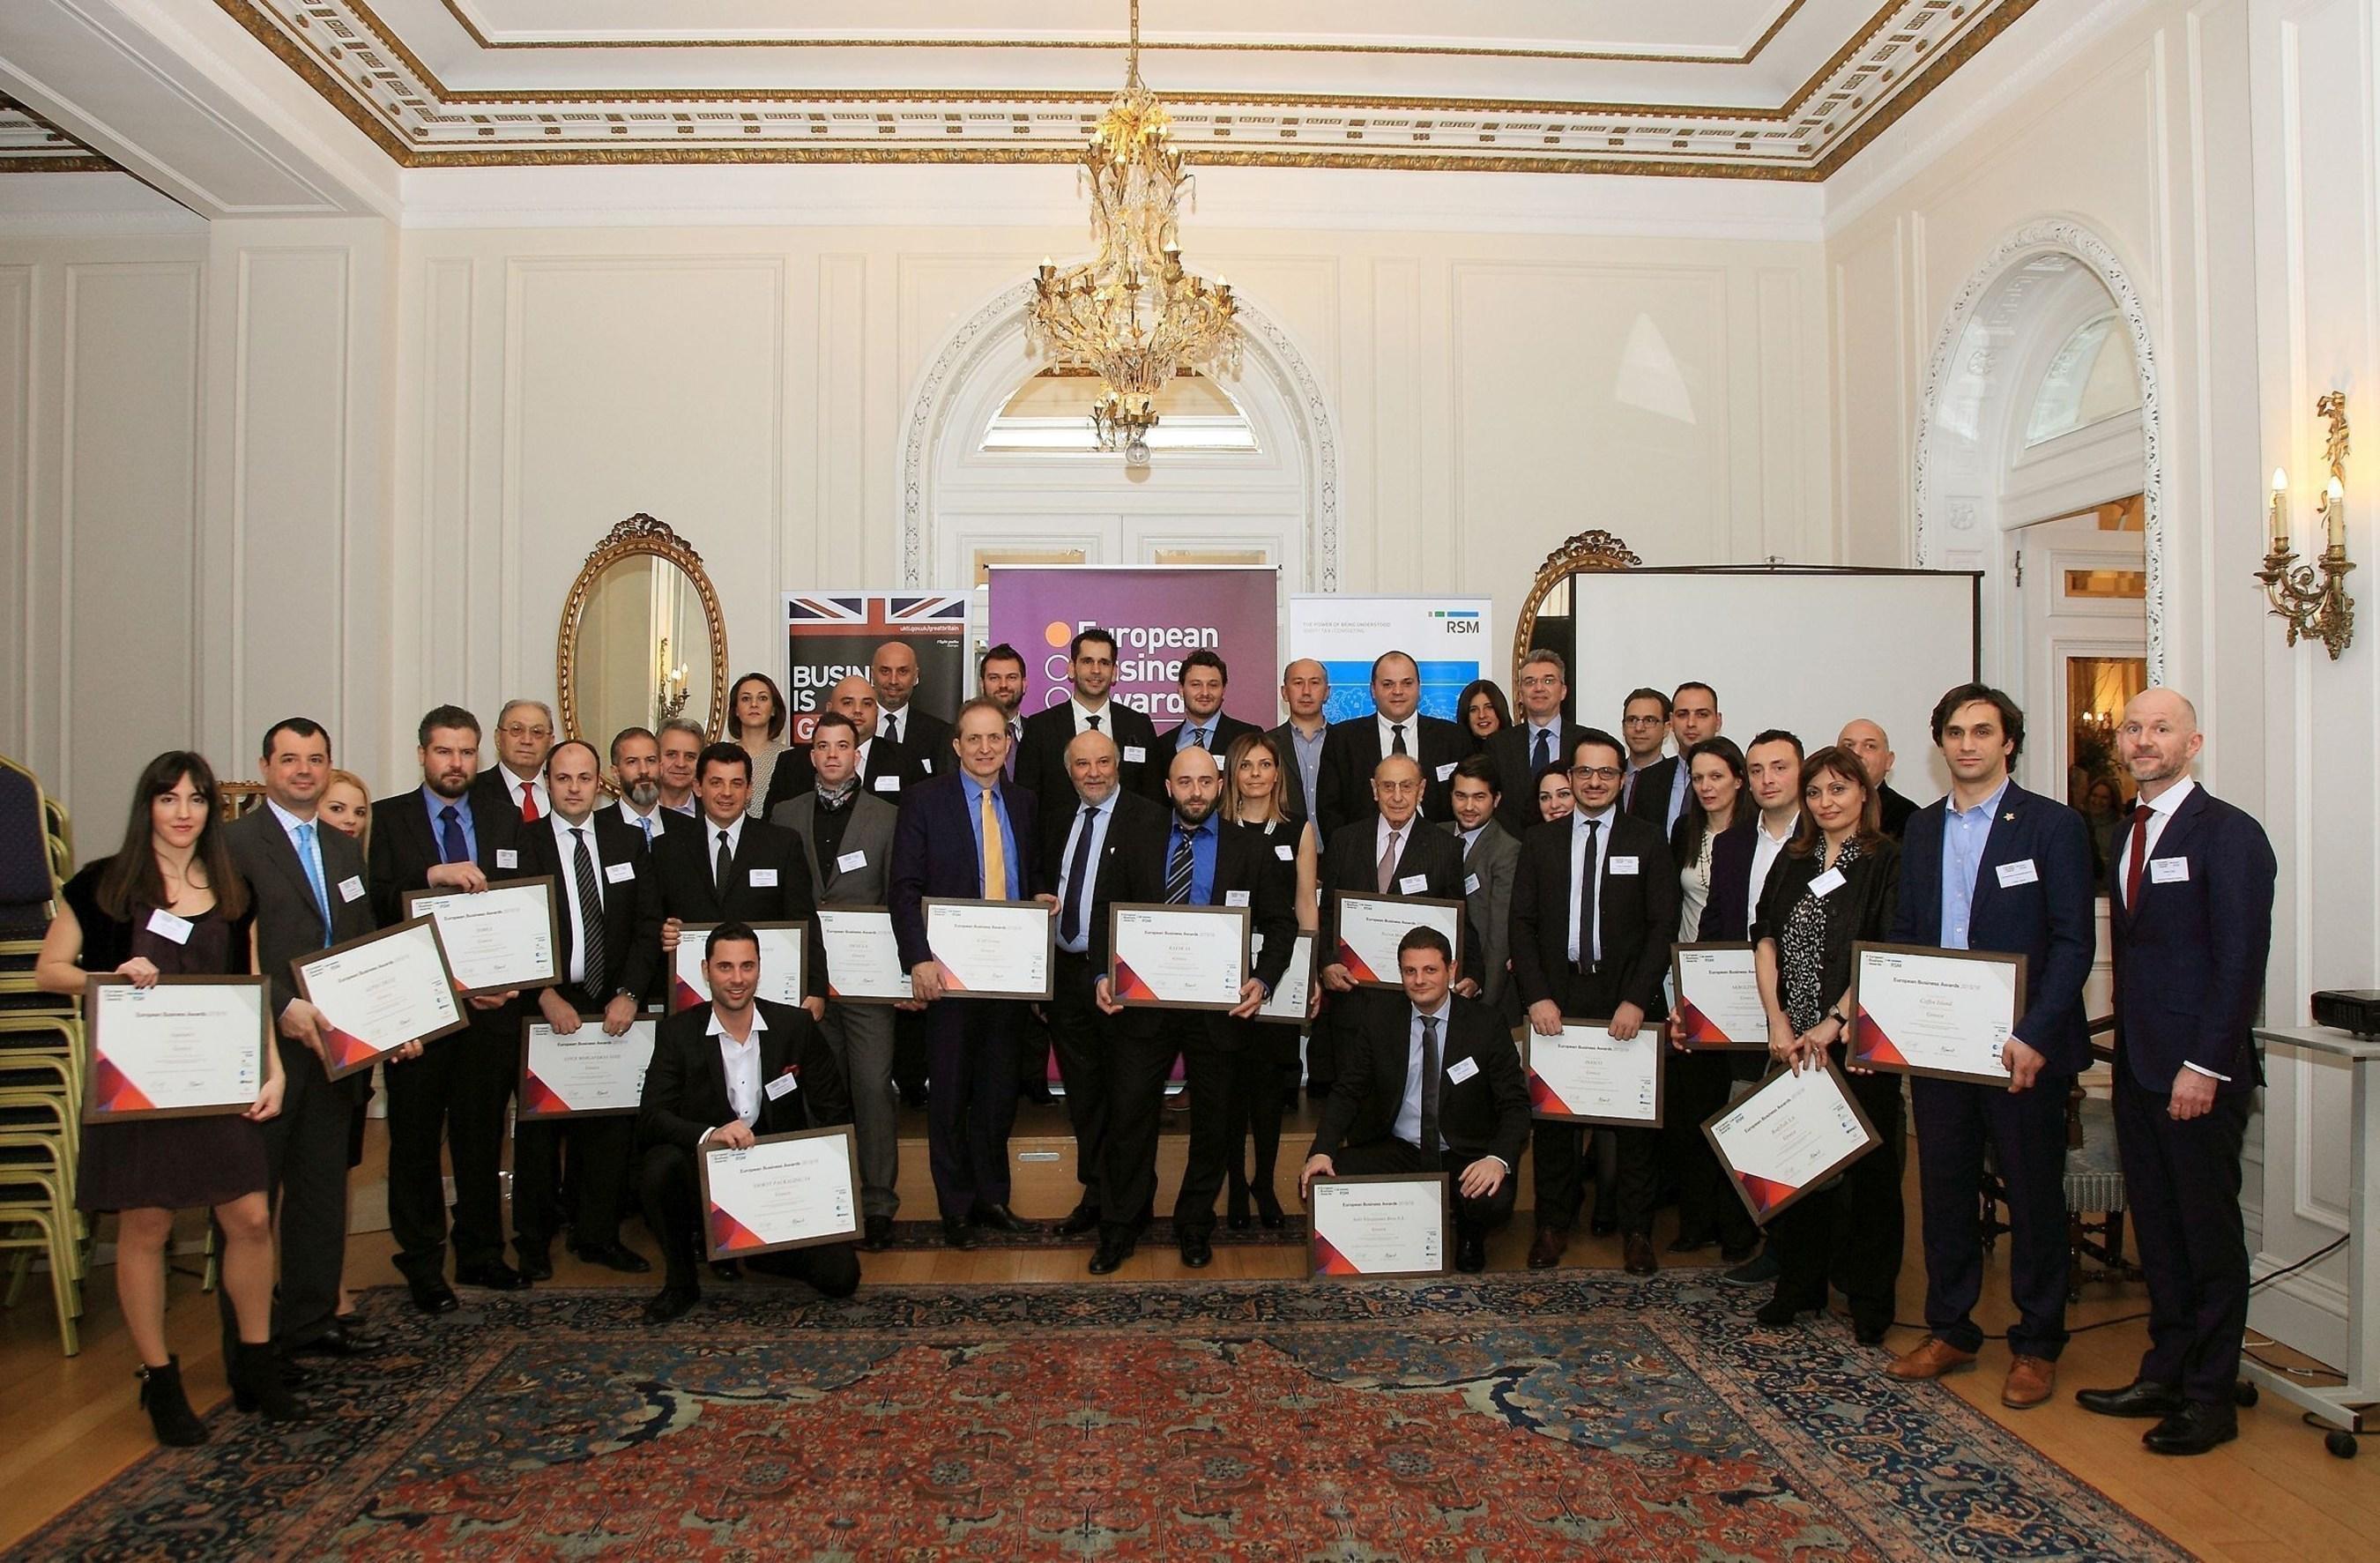 National Champions Greece (PRNewsFoto/European Business Awards) (PRNewsFoto/European Business Awards)